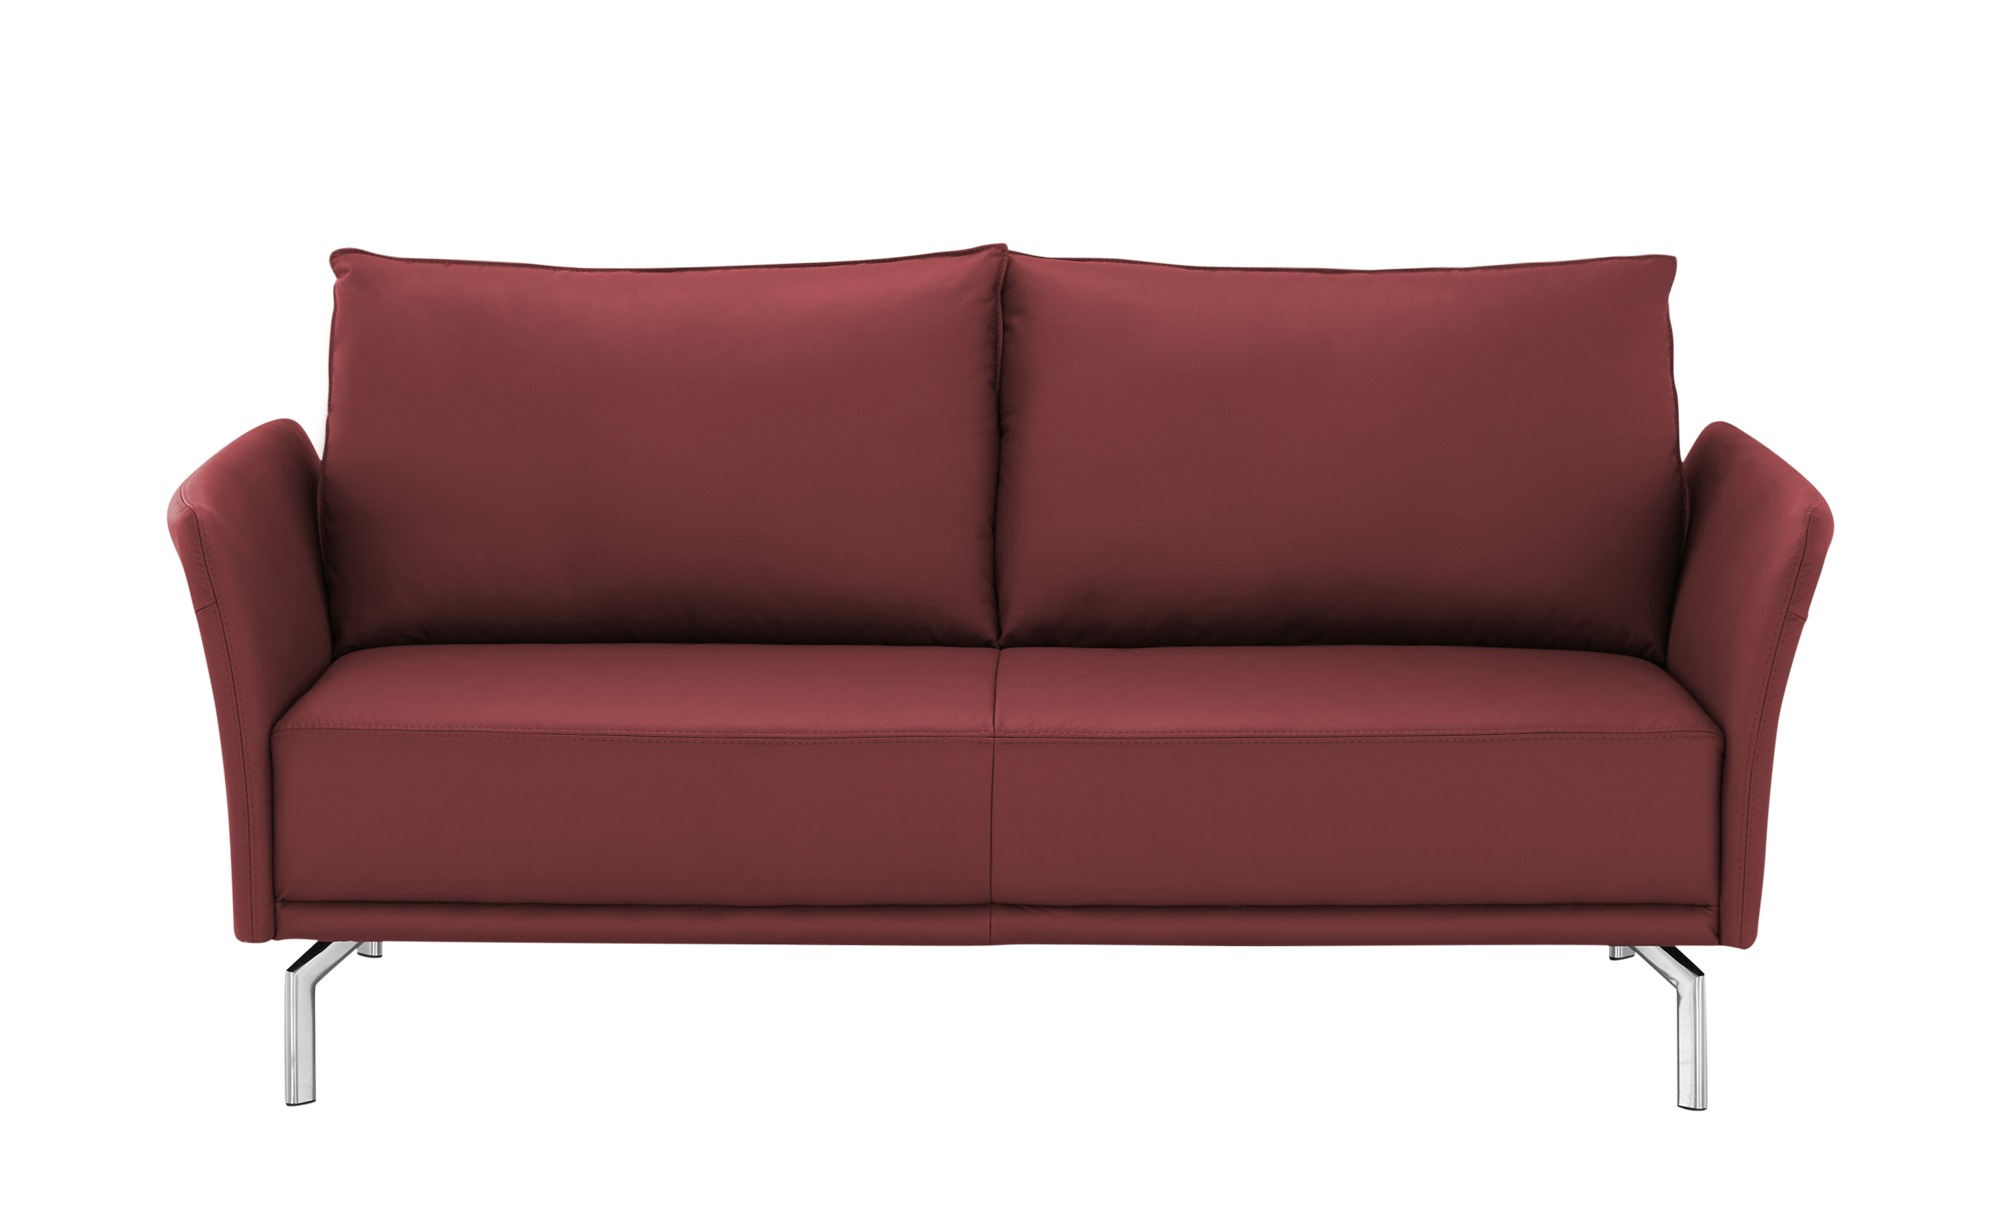 SOHO Sofa  Yamila ¦ rot ¦ Maße (cm): B: 192 H: 90 T: 89 Polstermöbel > Sofas > 3-Sitzer - Höffner